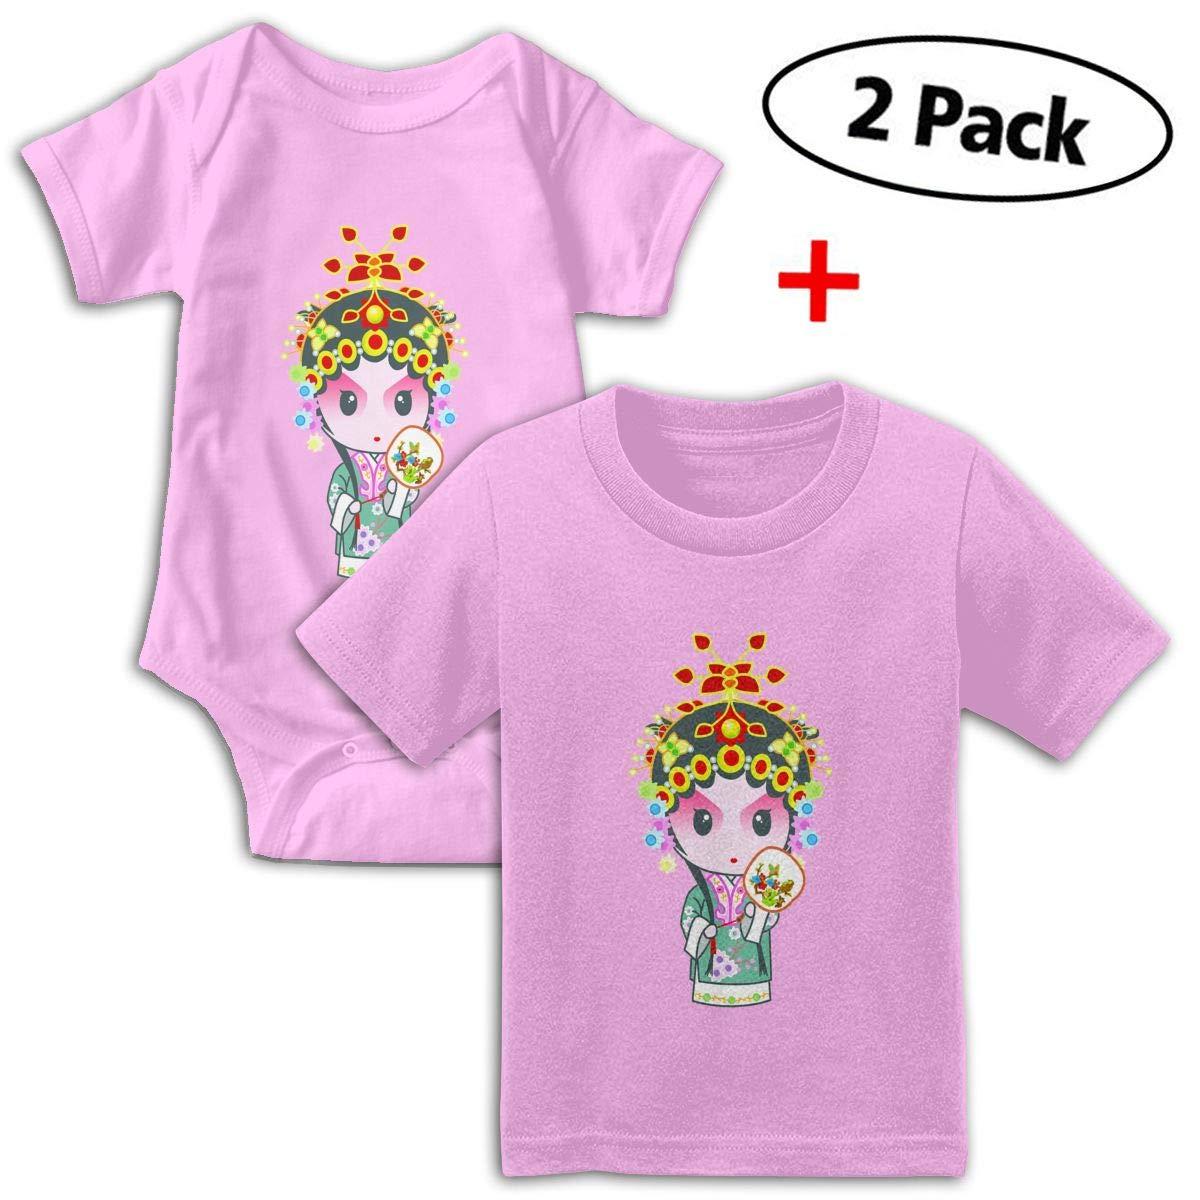 Chinese Peking Opera Babys Boys /& Girls Short Sleeve Jumpsuit Outfits And T-shirt